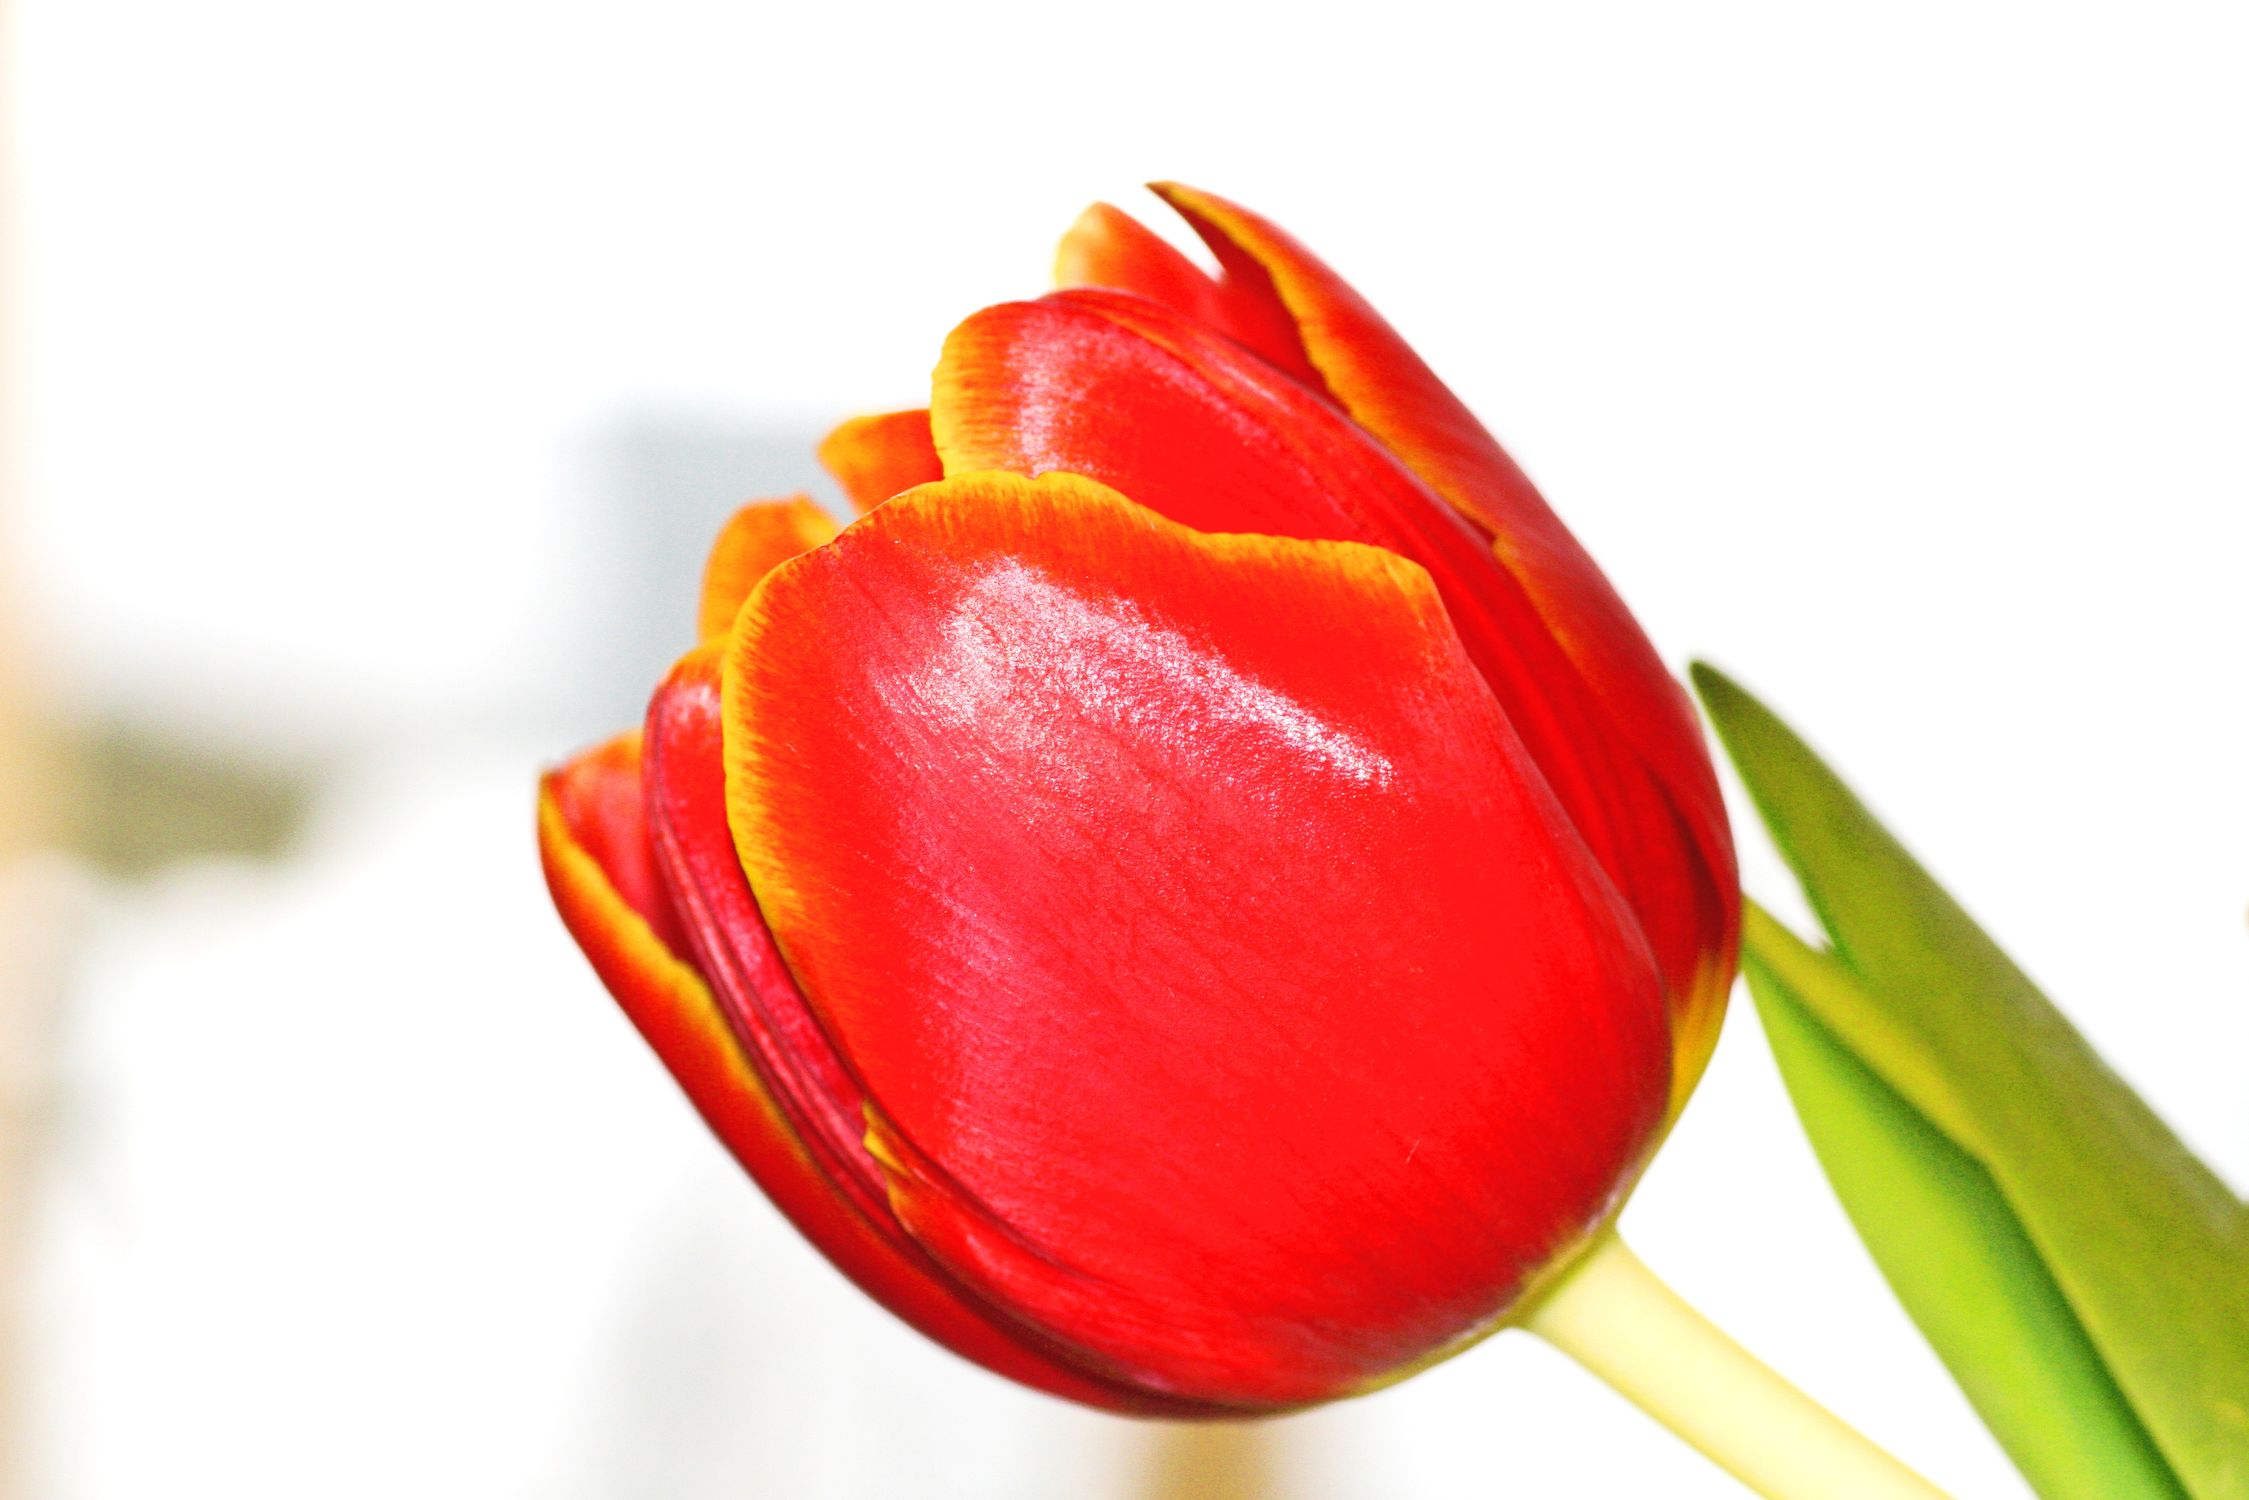 Bild mit Natur, Pflanzen, Blumen, Blumen, Blume, Pflanze, Tulpe, Tulips, Tulpen, Tulipa, Flower, Flowers, Tulip, rote Tulpe, rote Tulpen, red tulip, red tulips